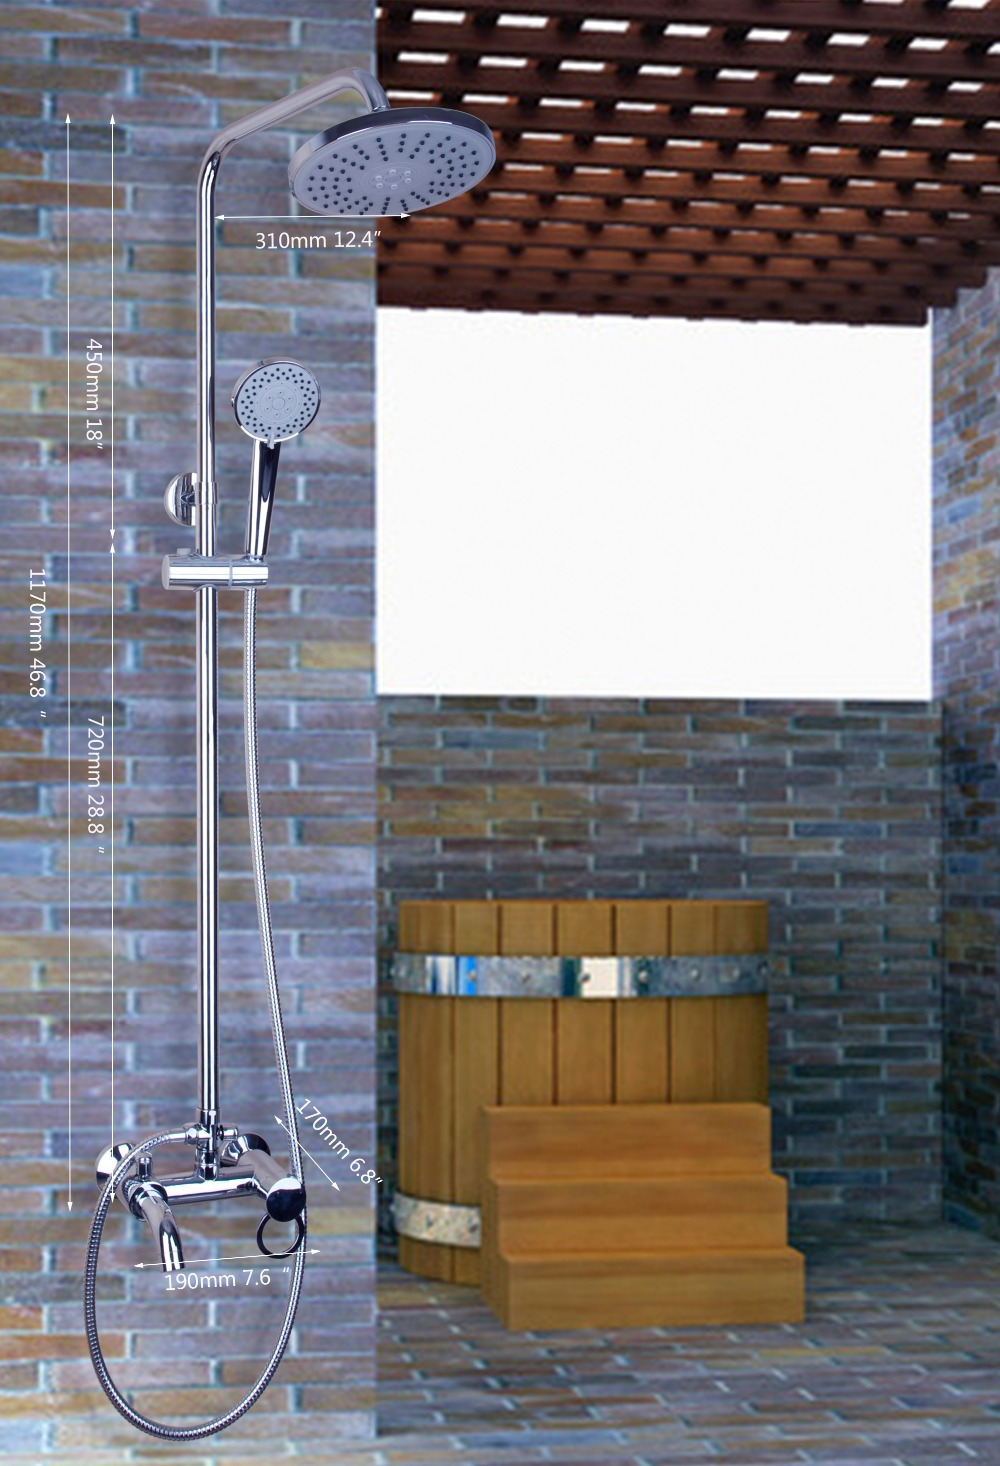 Hello Luxury Chrome Rain Shower Head Arm Bathroom Wall Mounted Shower Set Torneira 53002/1 Bathtub Chrome Sink Tap Mixer Faucet